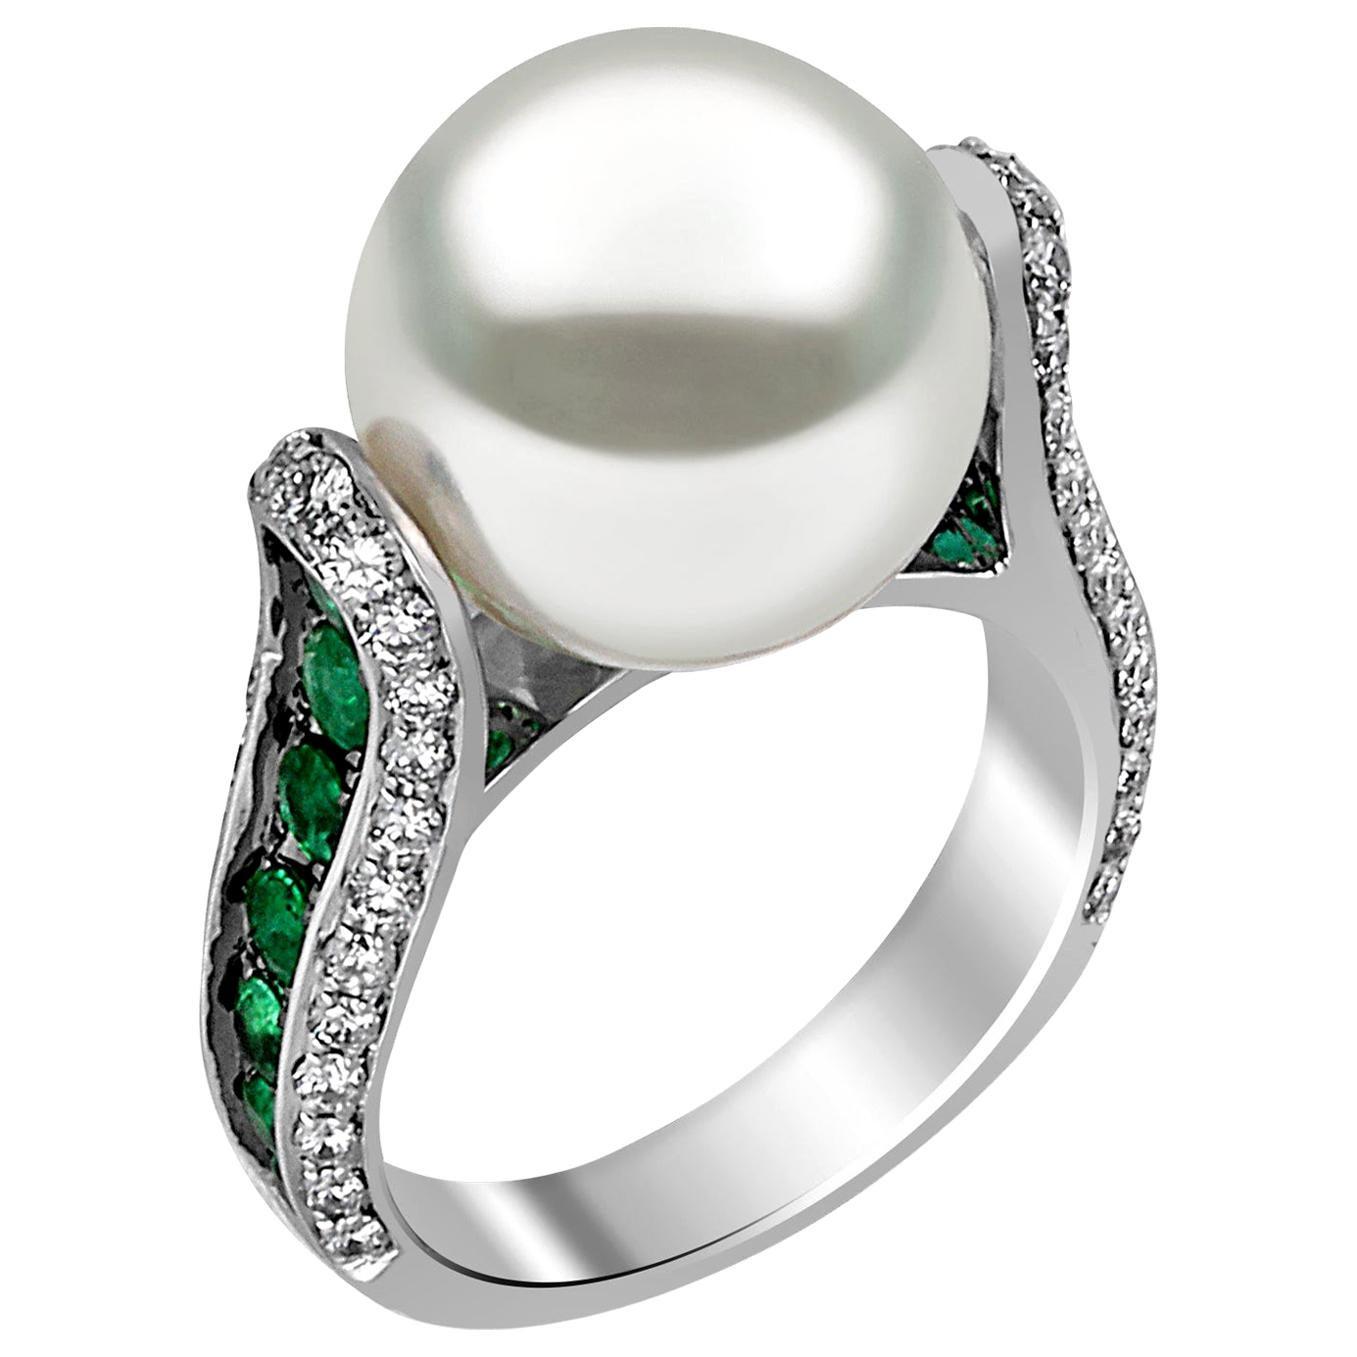 Yoko London South Sea Pearl, Emerald and Diamond Ring in 18 Karat White Gold